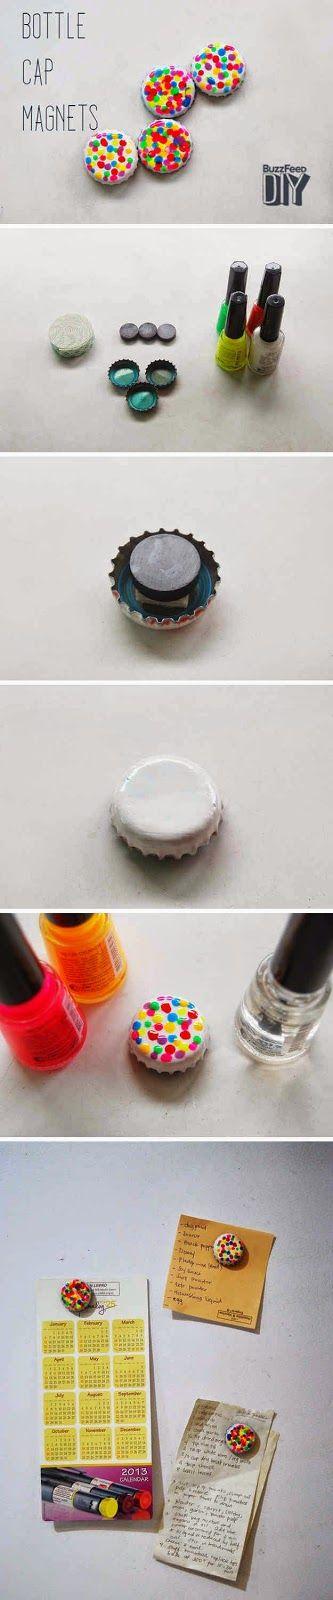 aimant capsule miroir